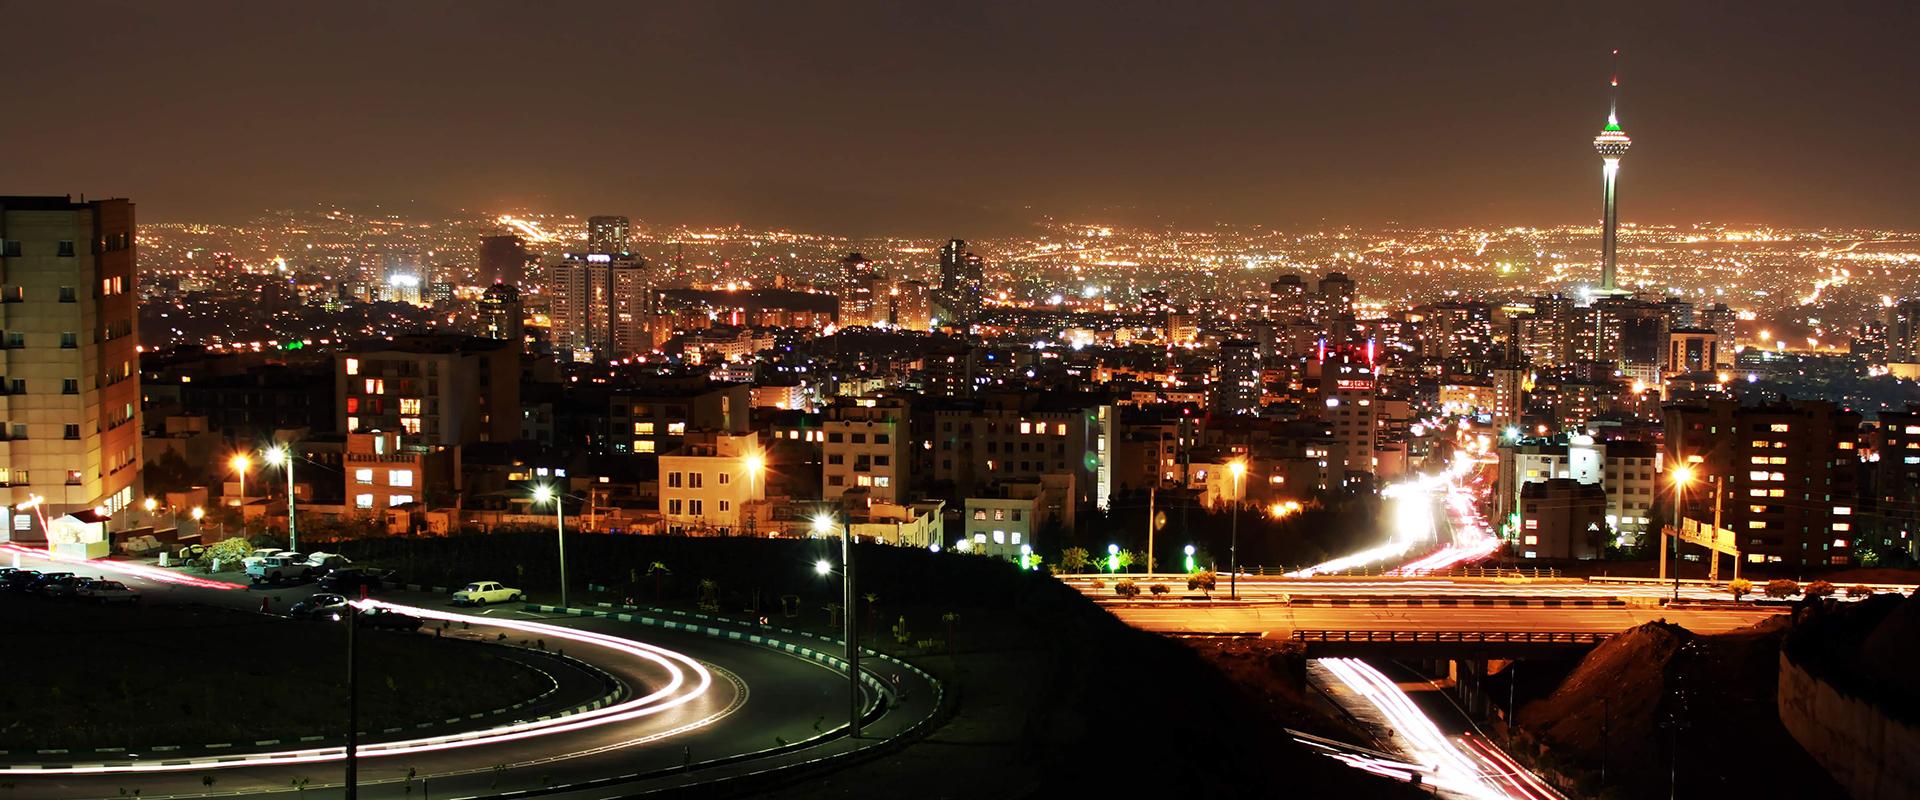 Teheran Reisefhrer Teheran Entdecken Aegean Airlines